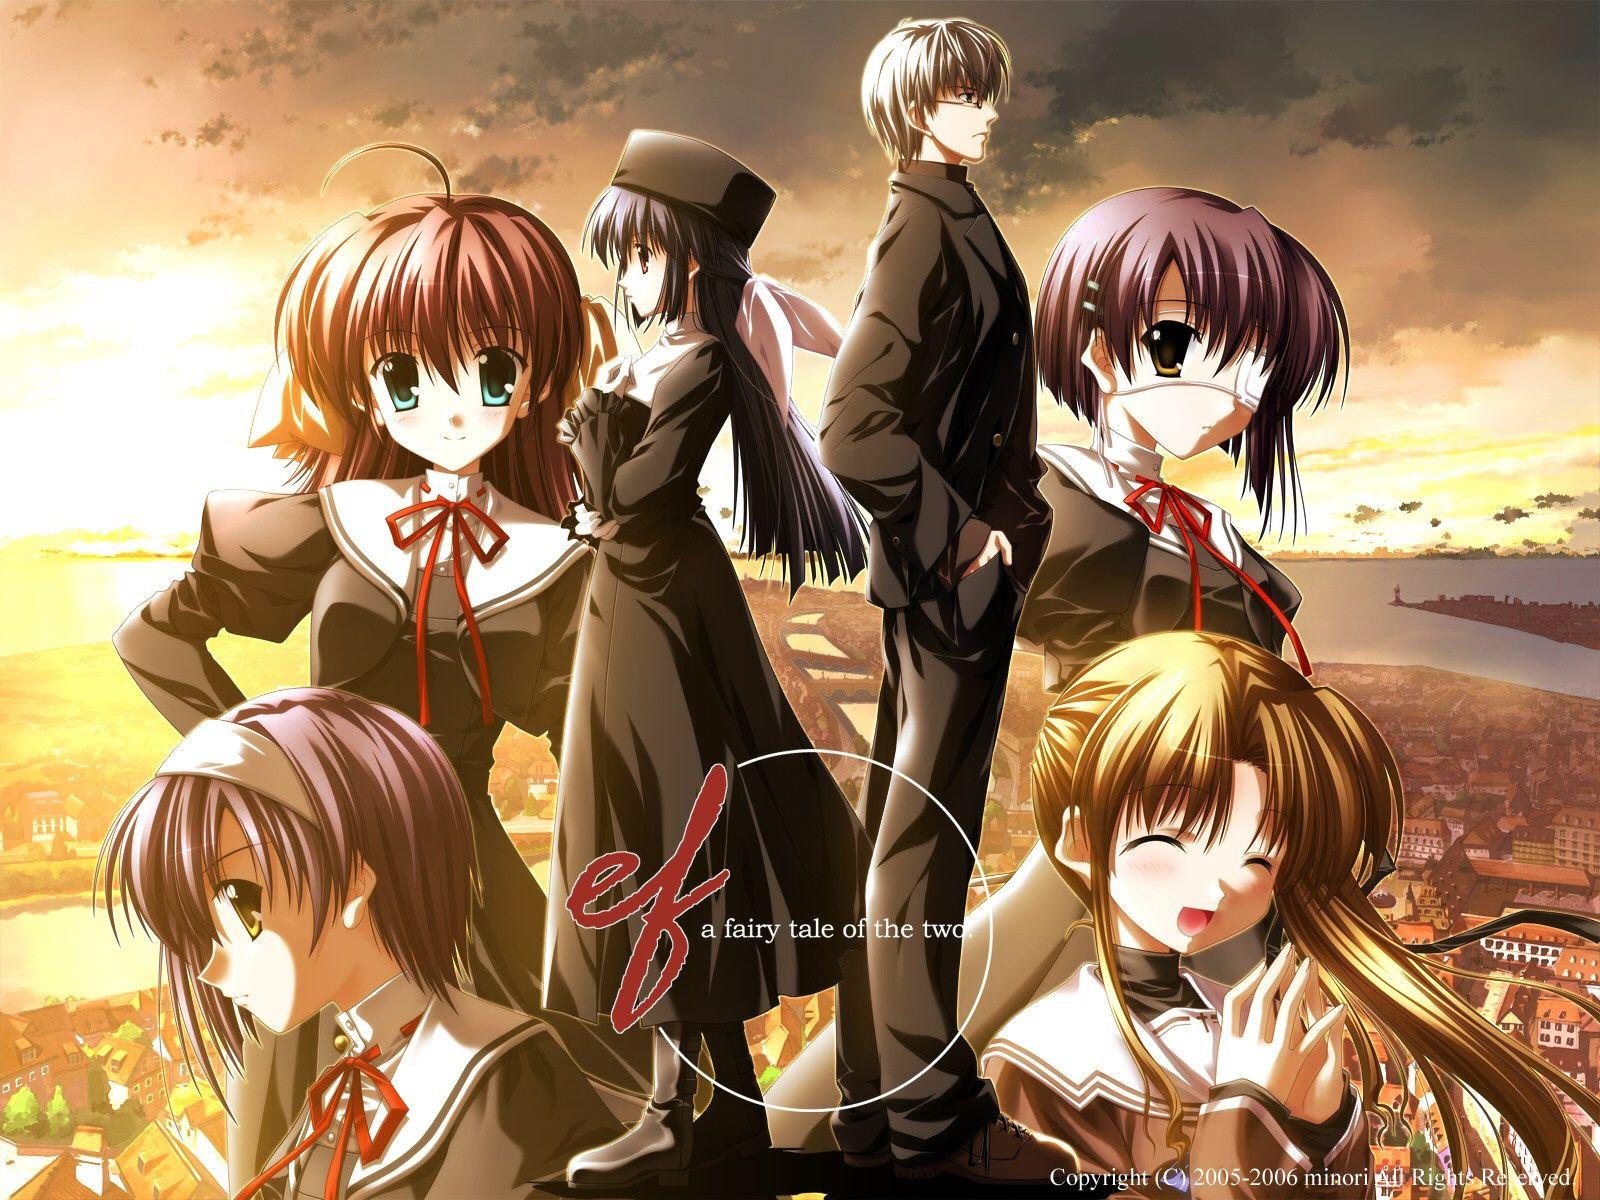 Ef A Tale Of Memories Anime Romance Anime Anime Love Triangle